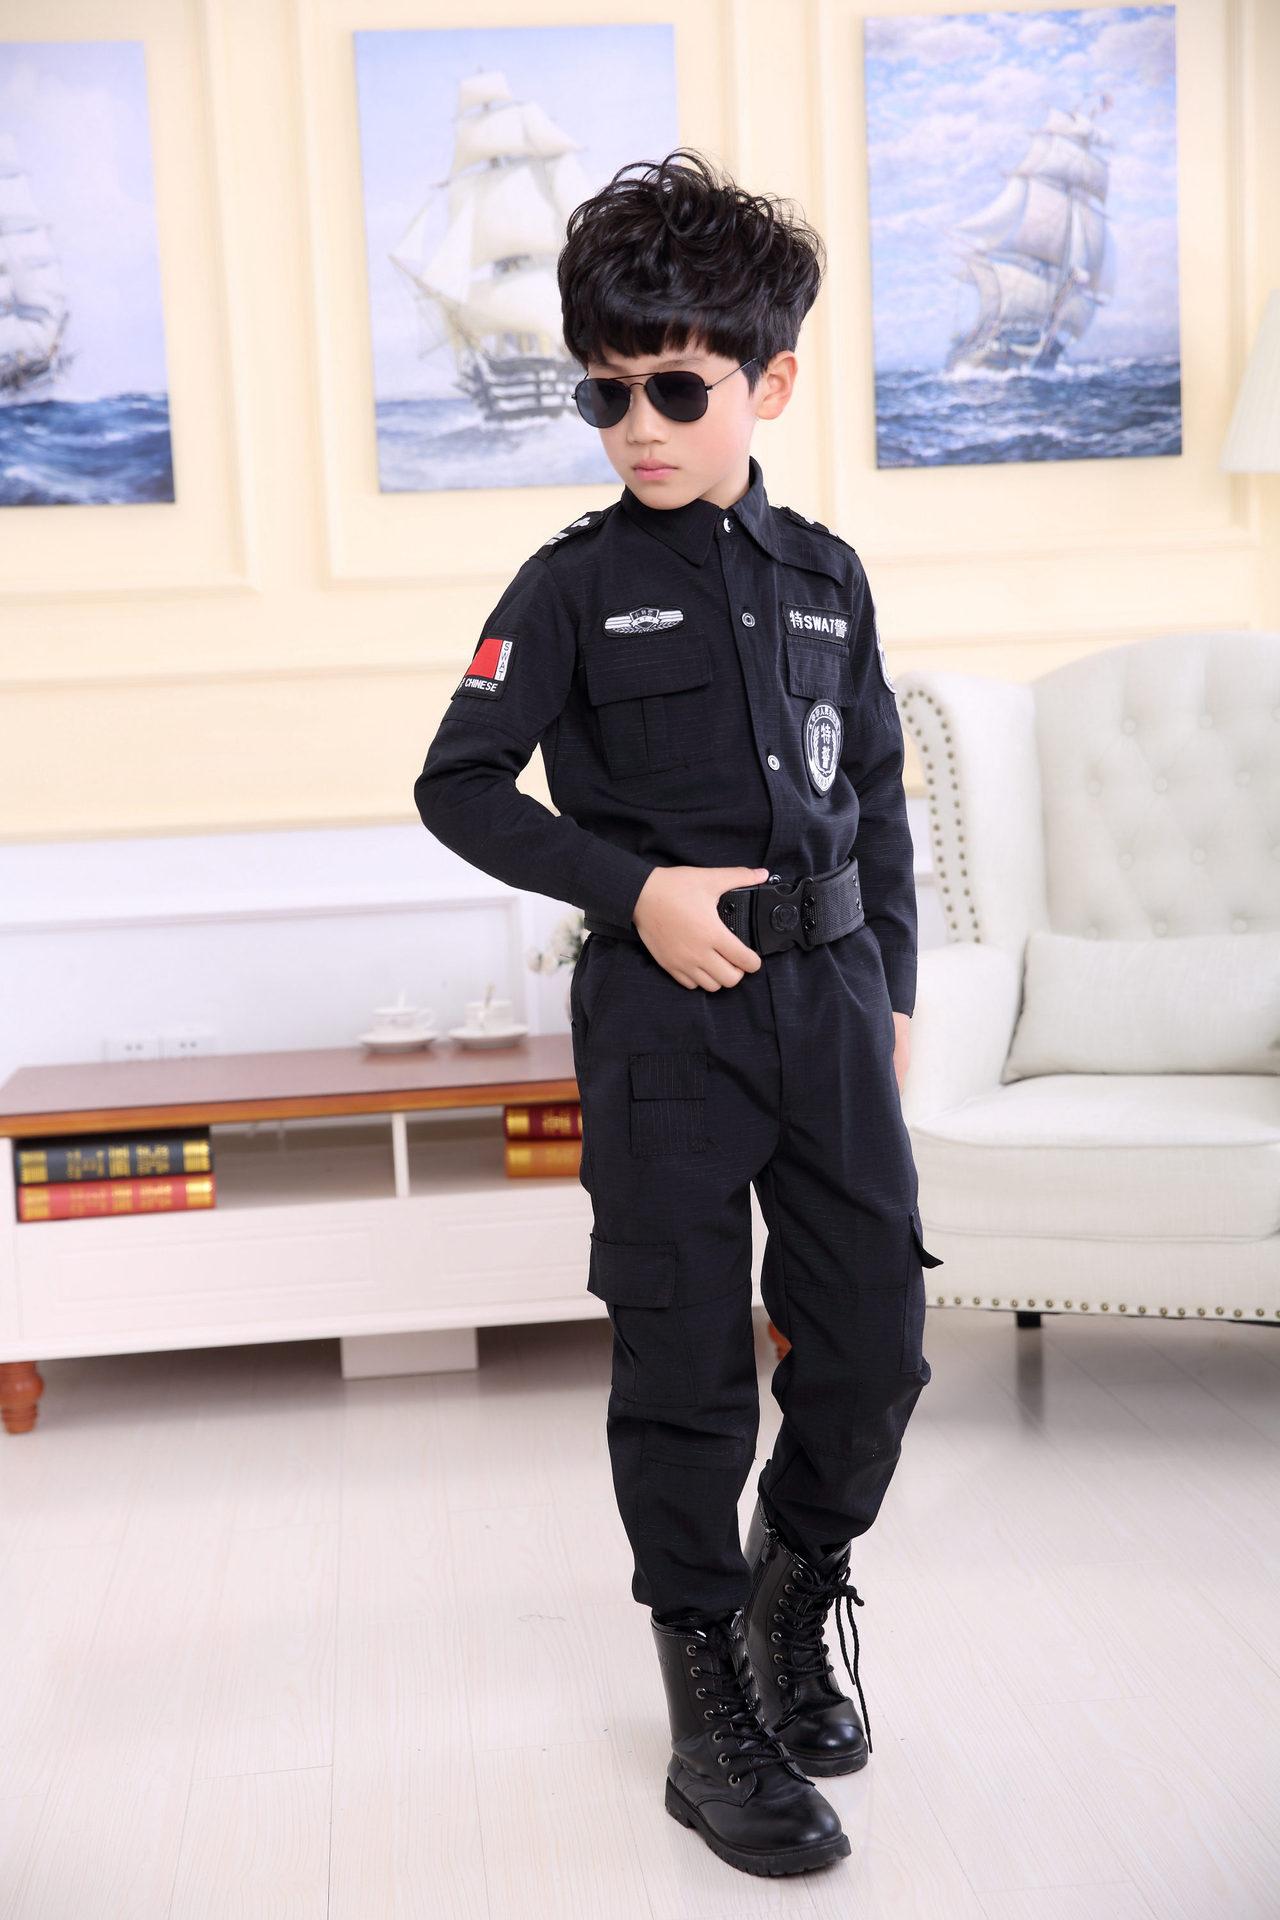 New Style CHILDREN'S Costume Traffic Police Uniform Set Nursing Performance SWAT Costumes Less Children Secret Service Clothing